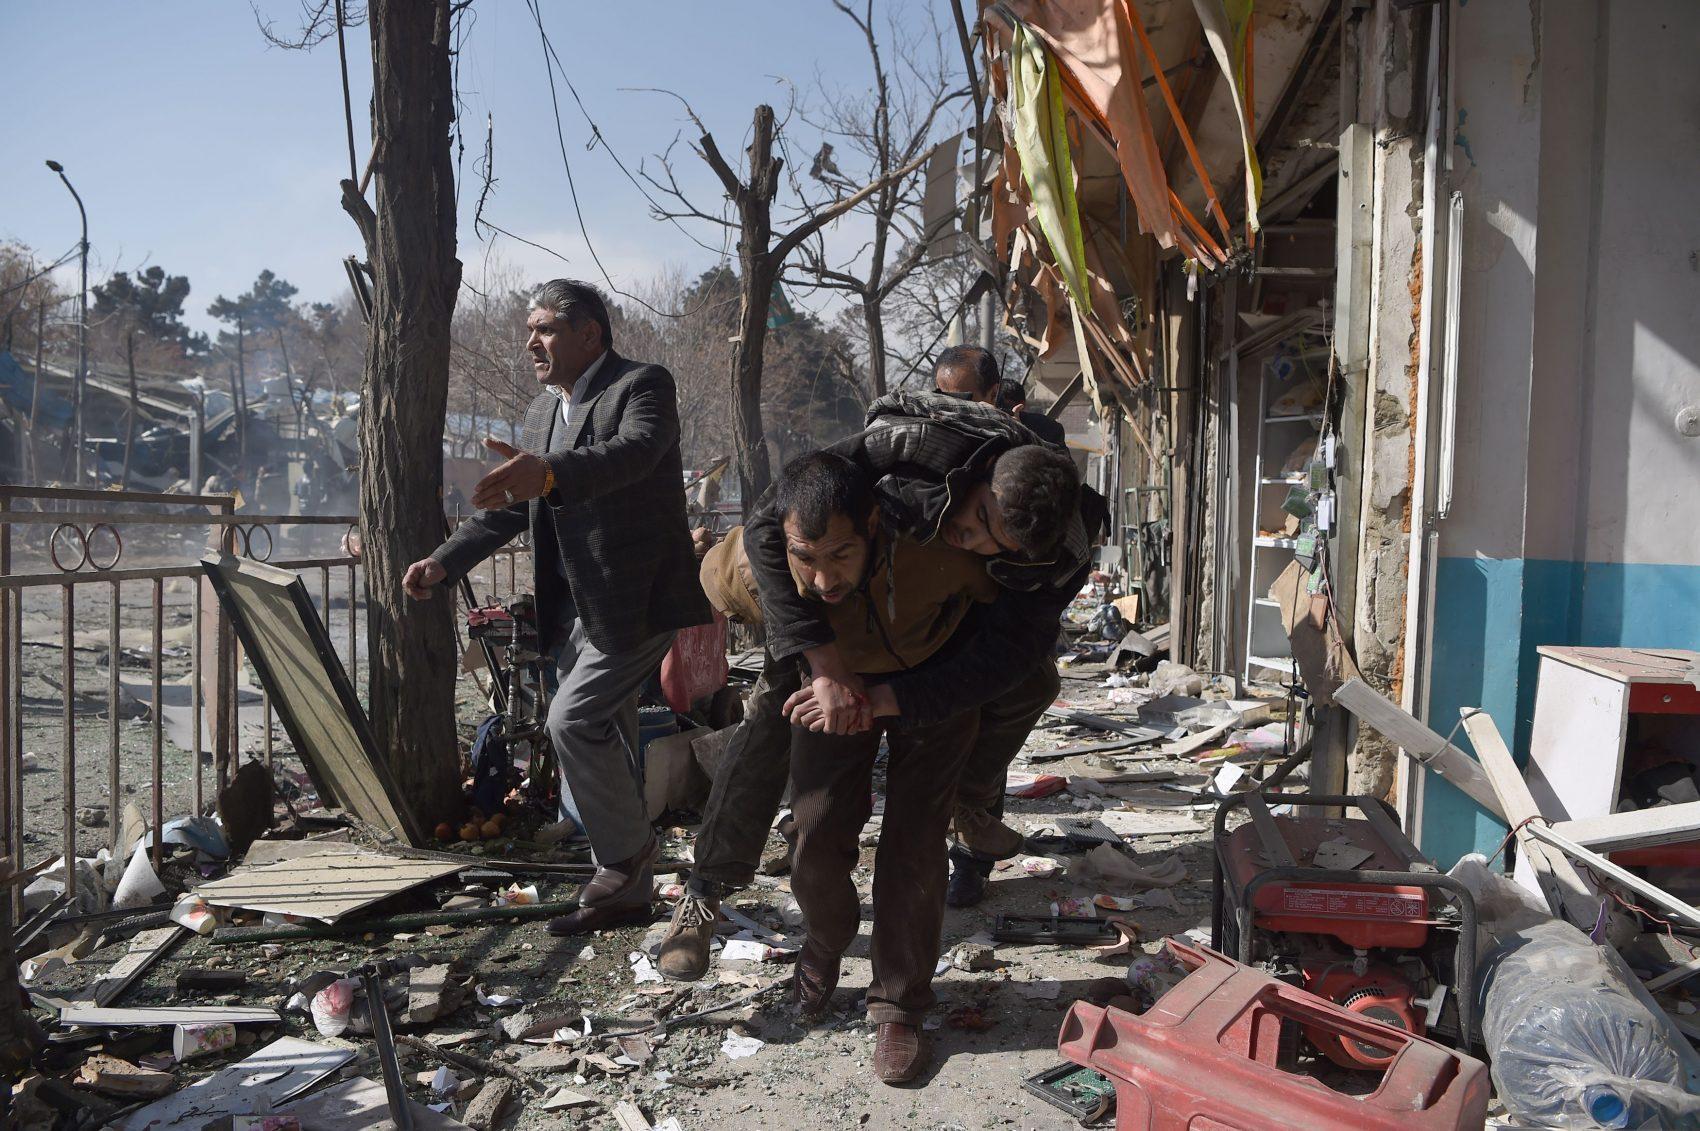 30 civilians released, 8 militants killed in Afghanistan